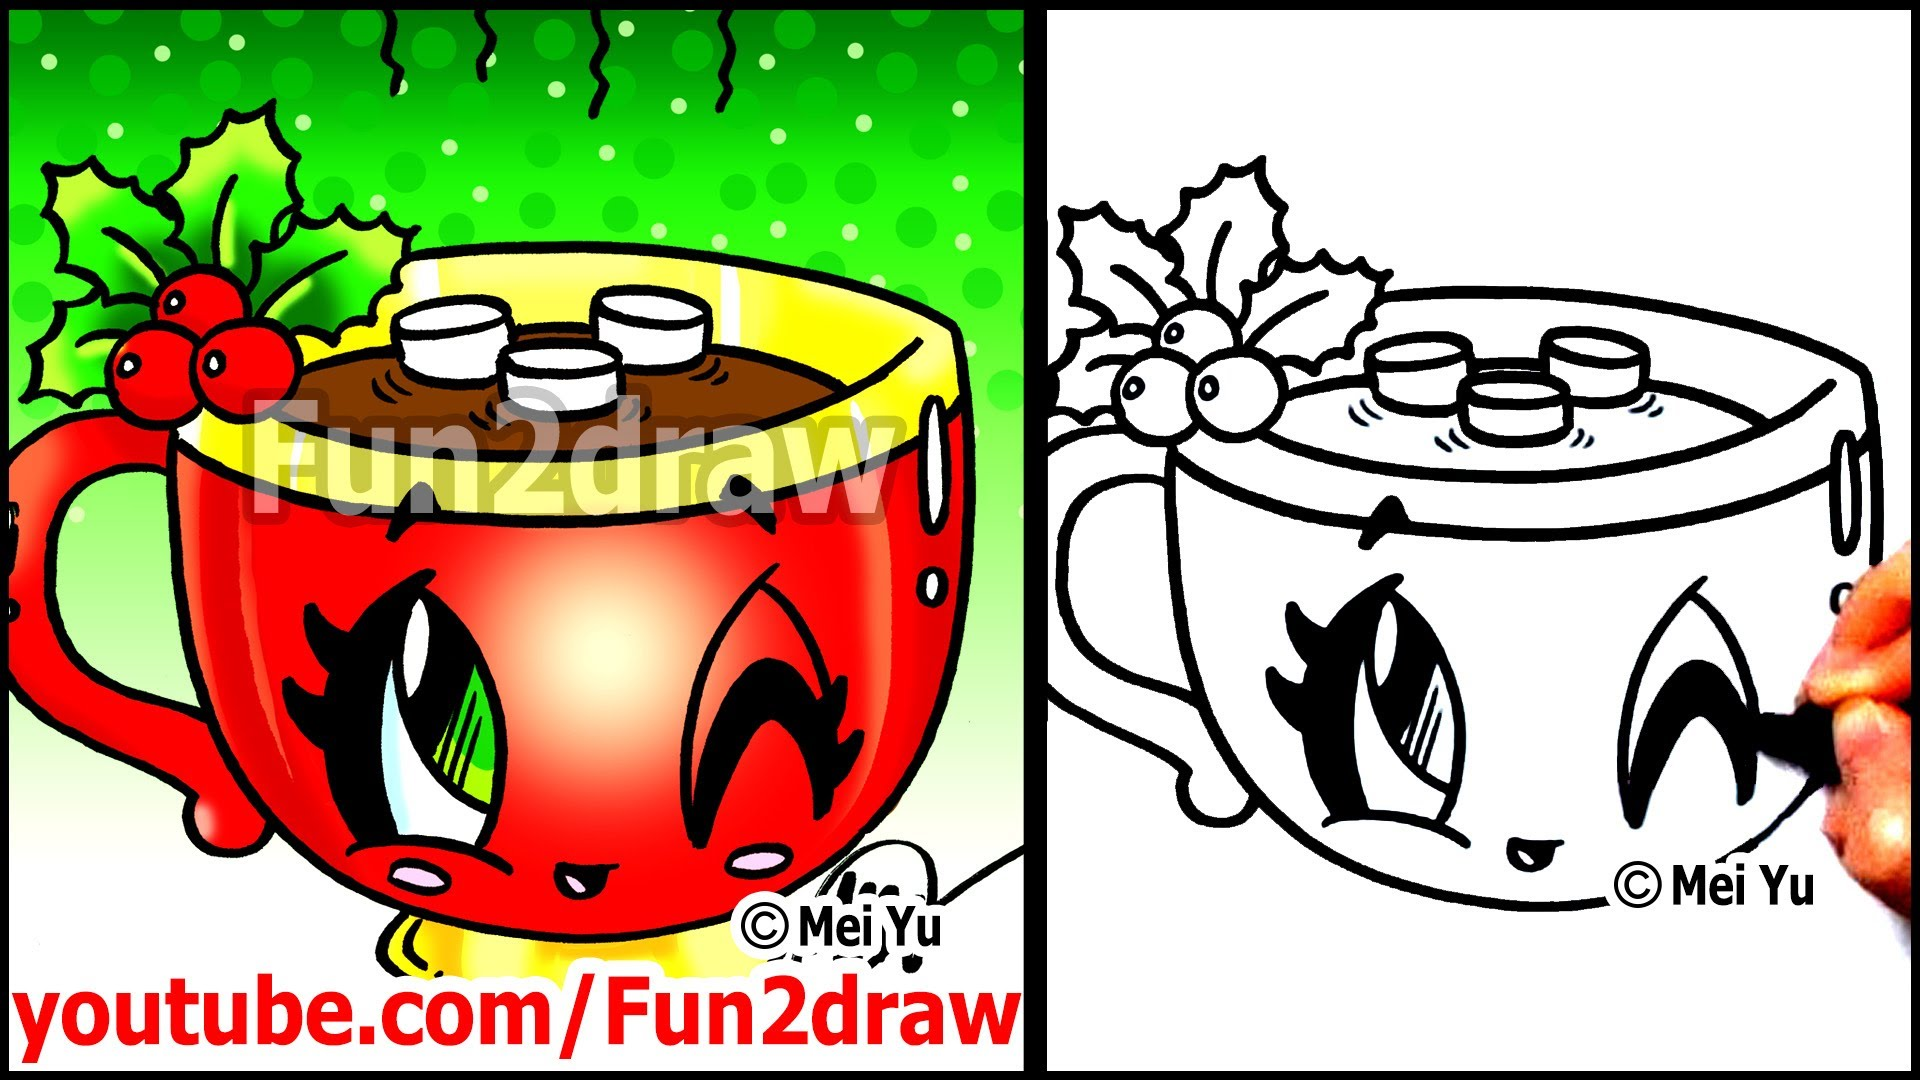 Drawn santa fun2draw + Hot How to Art